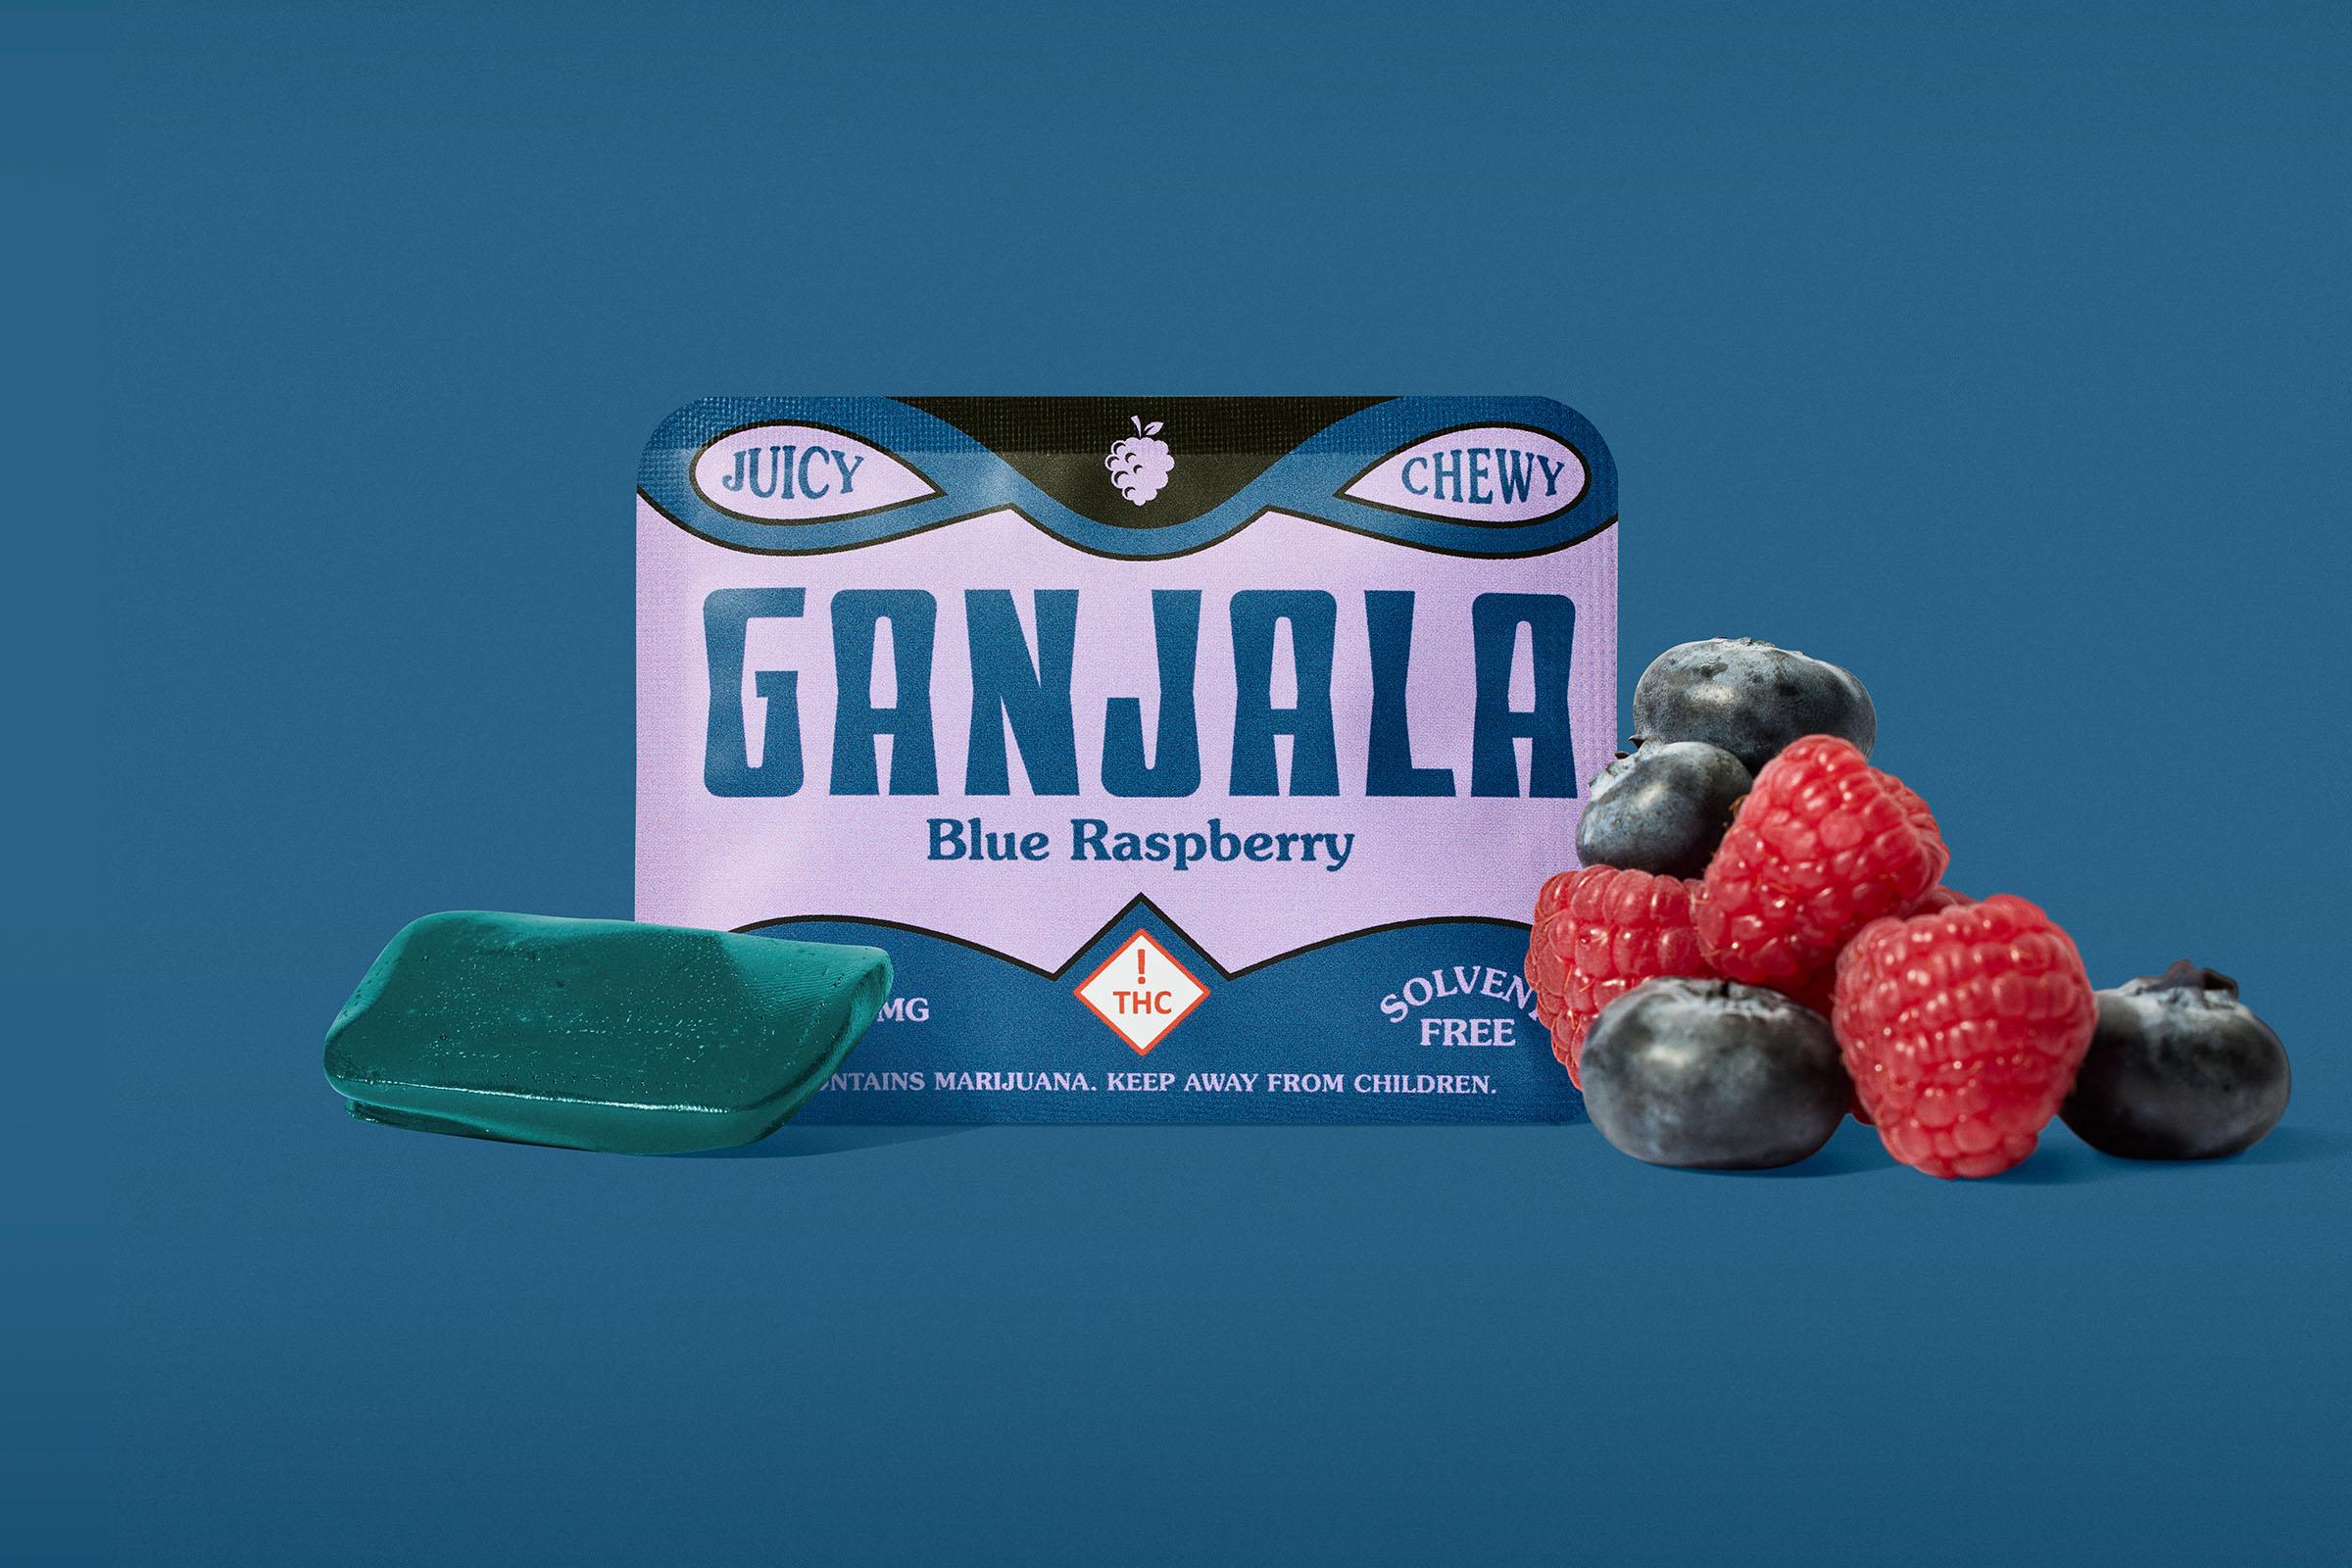 ganjala_blueraspberry